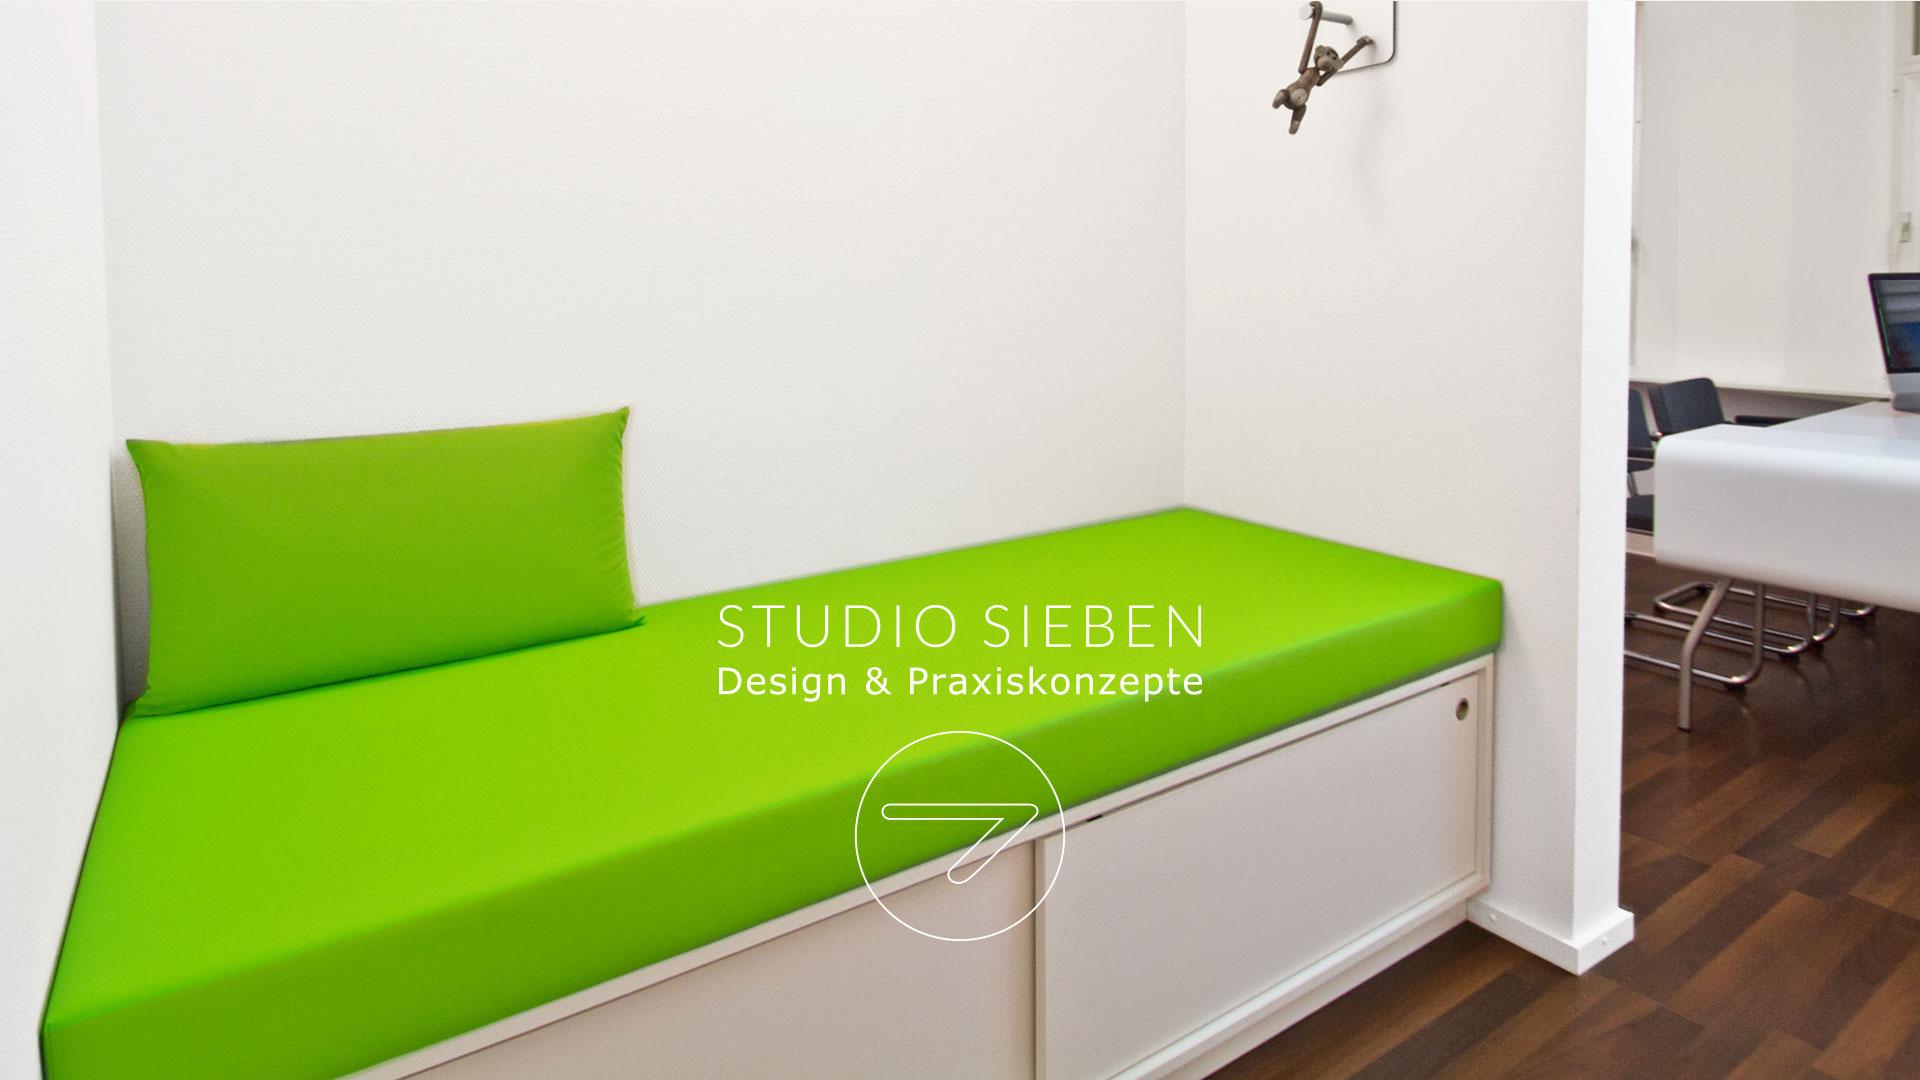 praxis-uk-psychiater-hamburg-behandlungszimmer-innenausbau